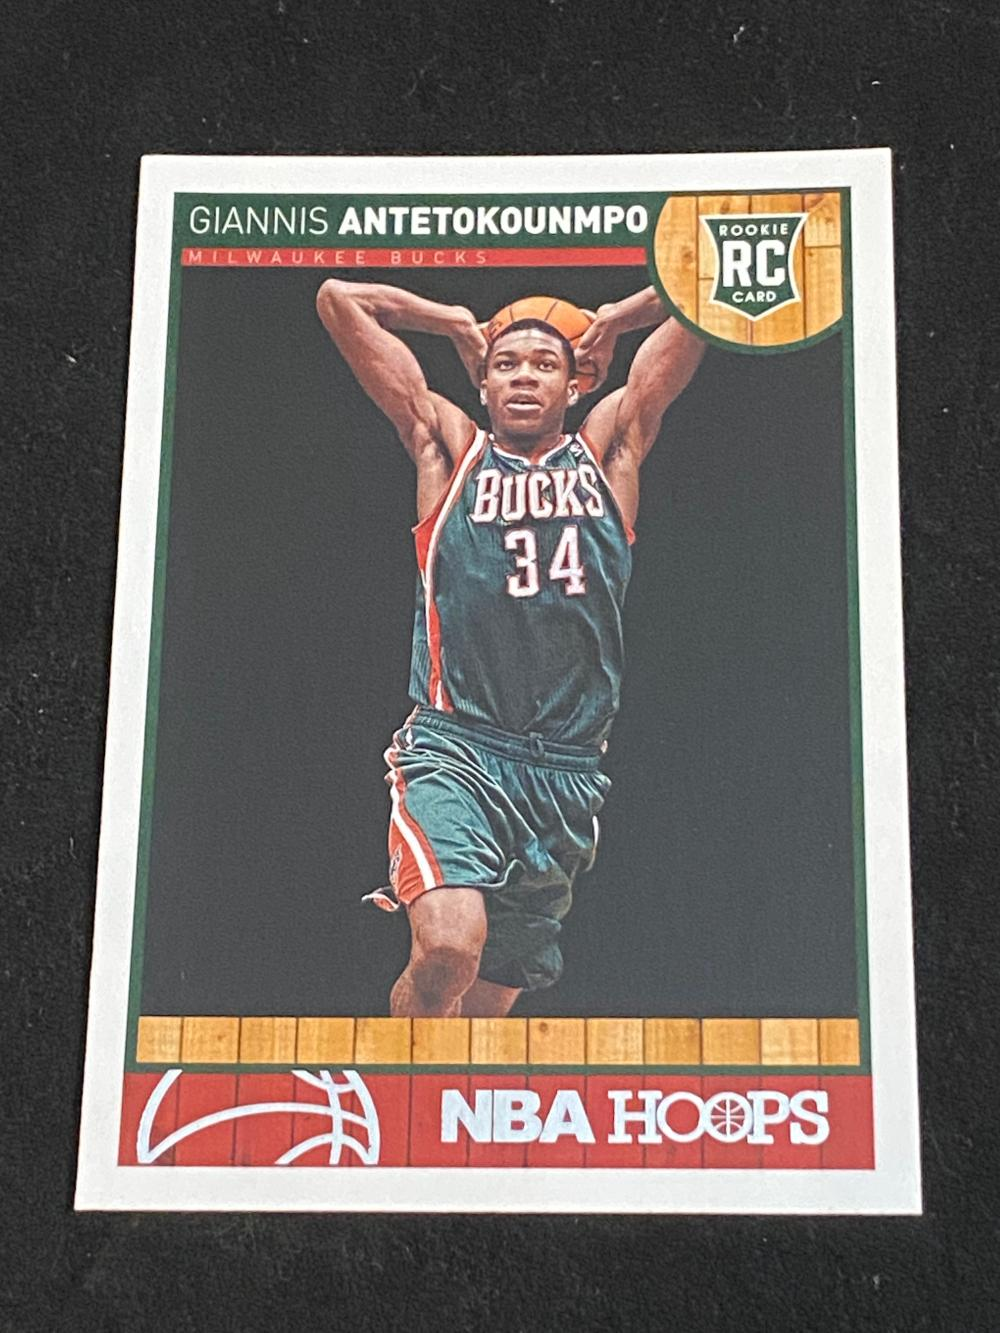 (NM-MT) 2013-14 Panini NBA Hoops Giannis Antetokounmpo Rookie #275 Basketball Card